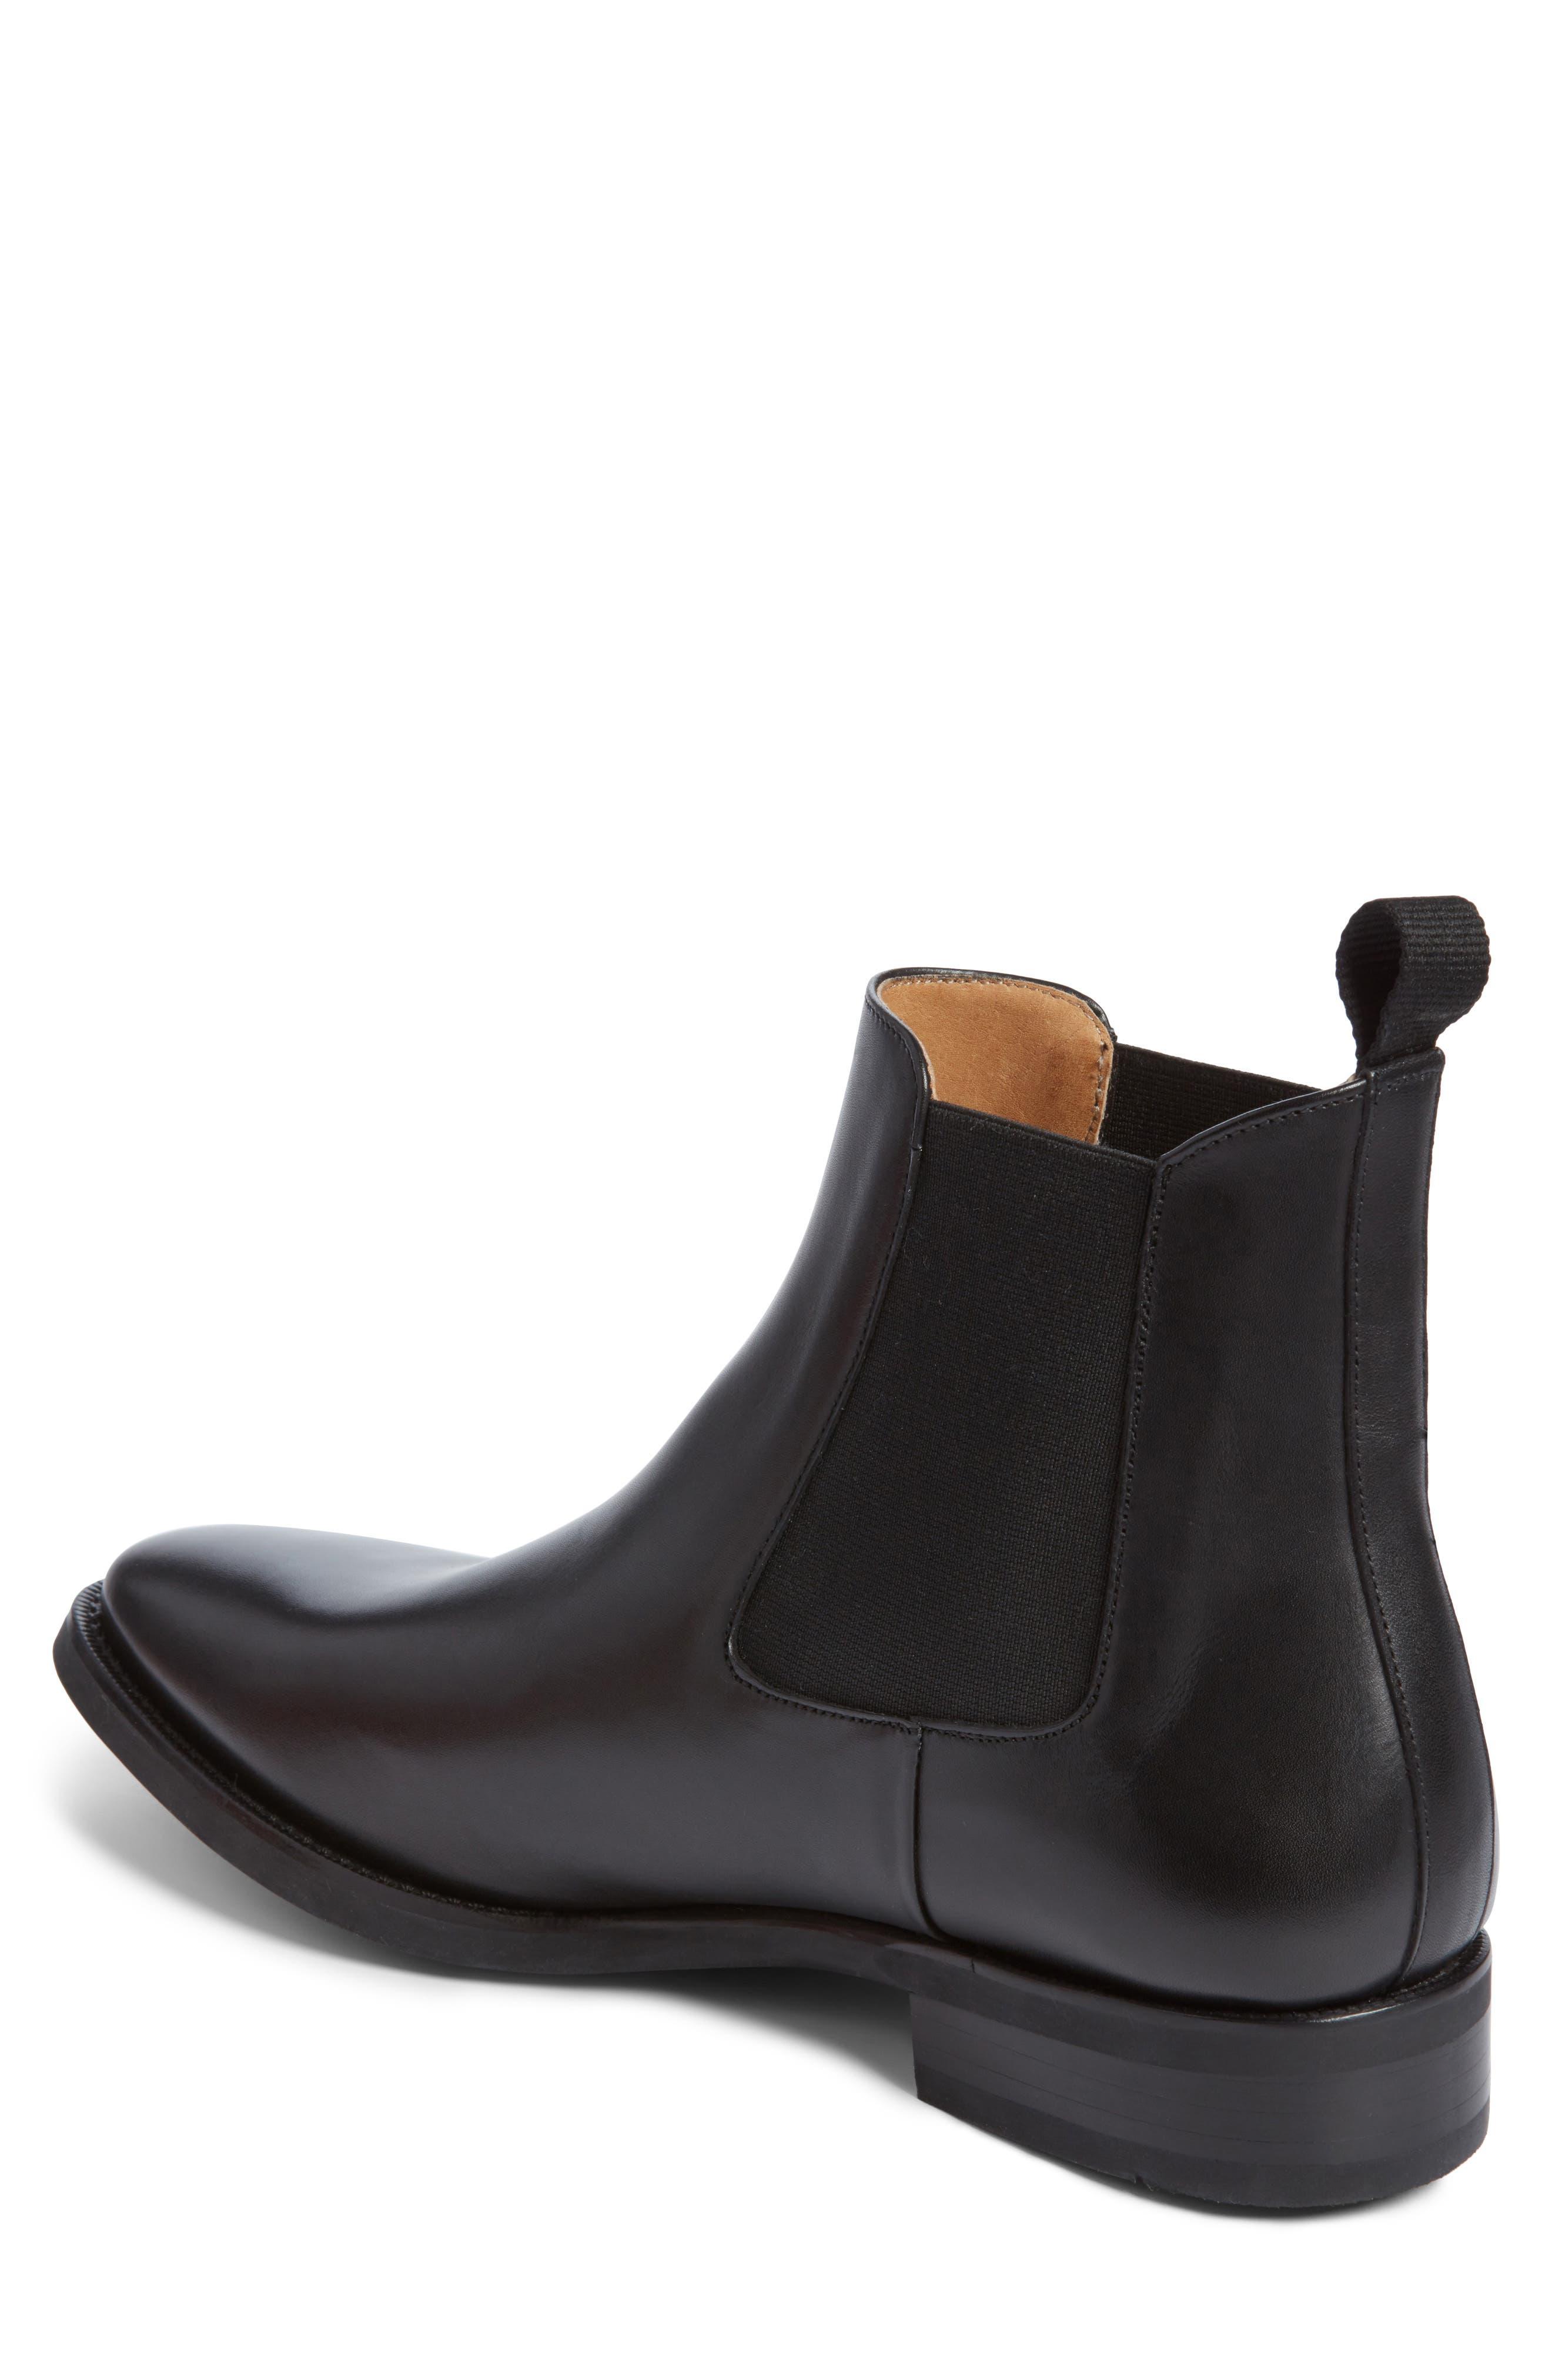 Ellis Water Resistant Chelsea Boot,                             Alternate thumbnail 2, color,                             Black Leather